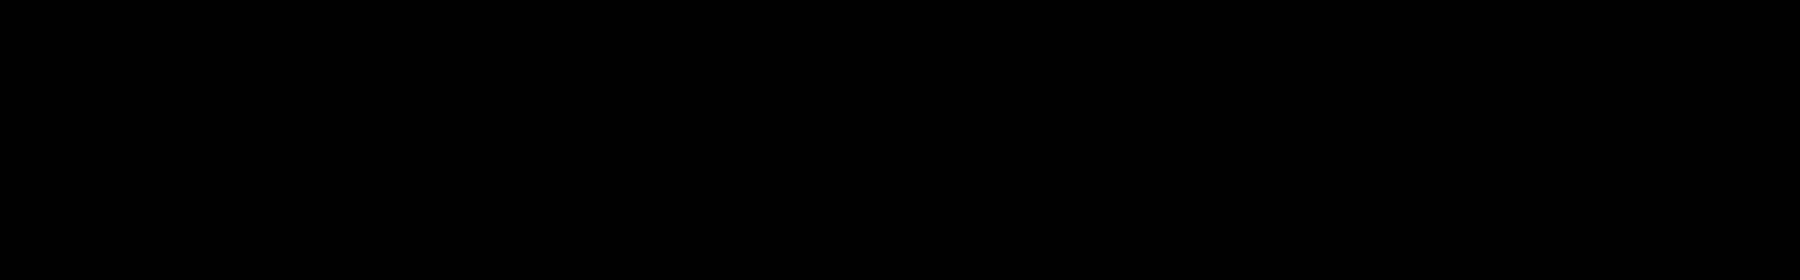 FM8 Atmosphere's audio waveform